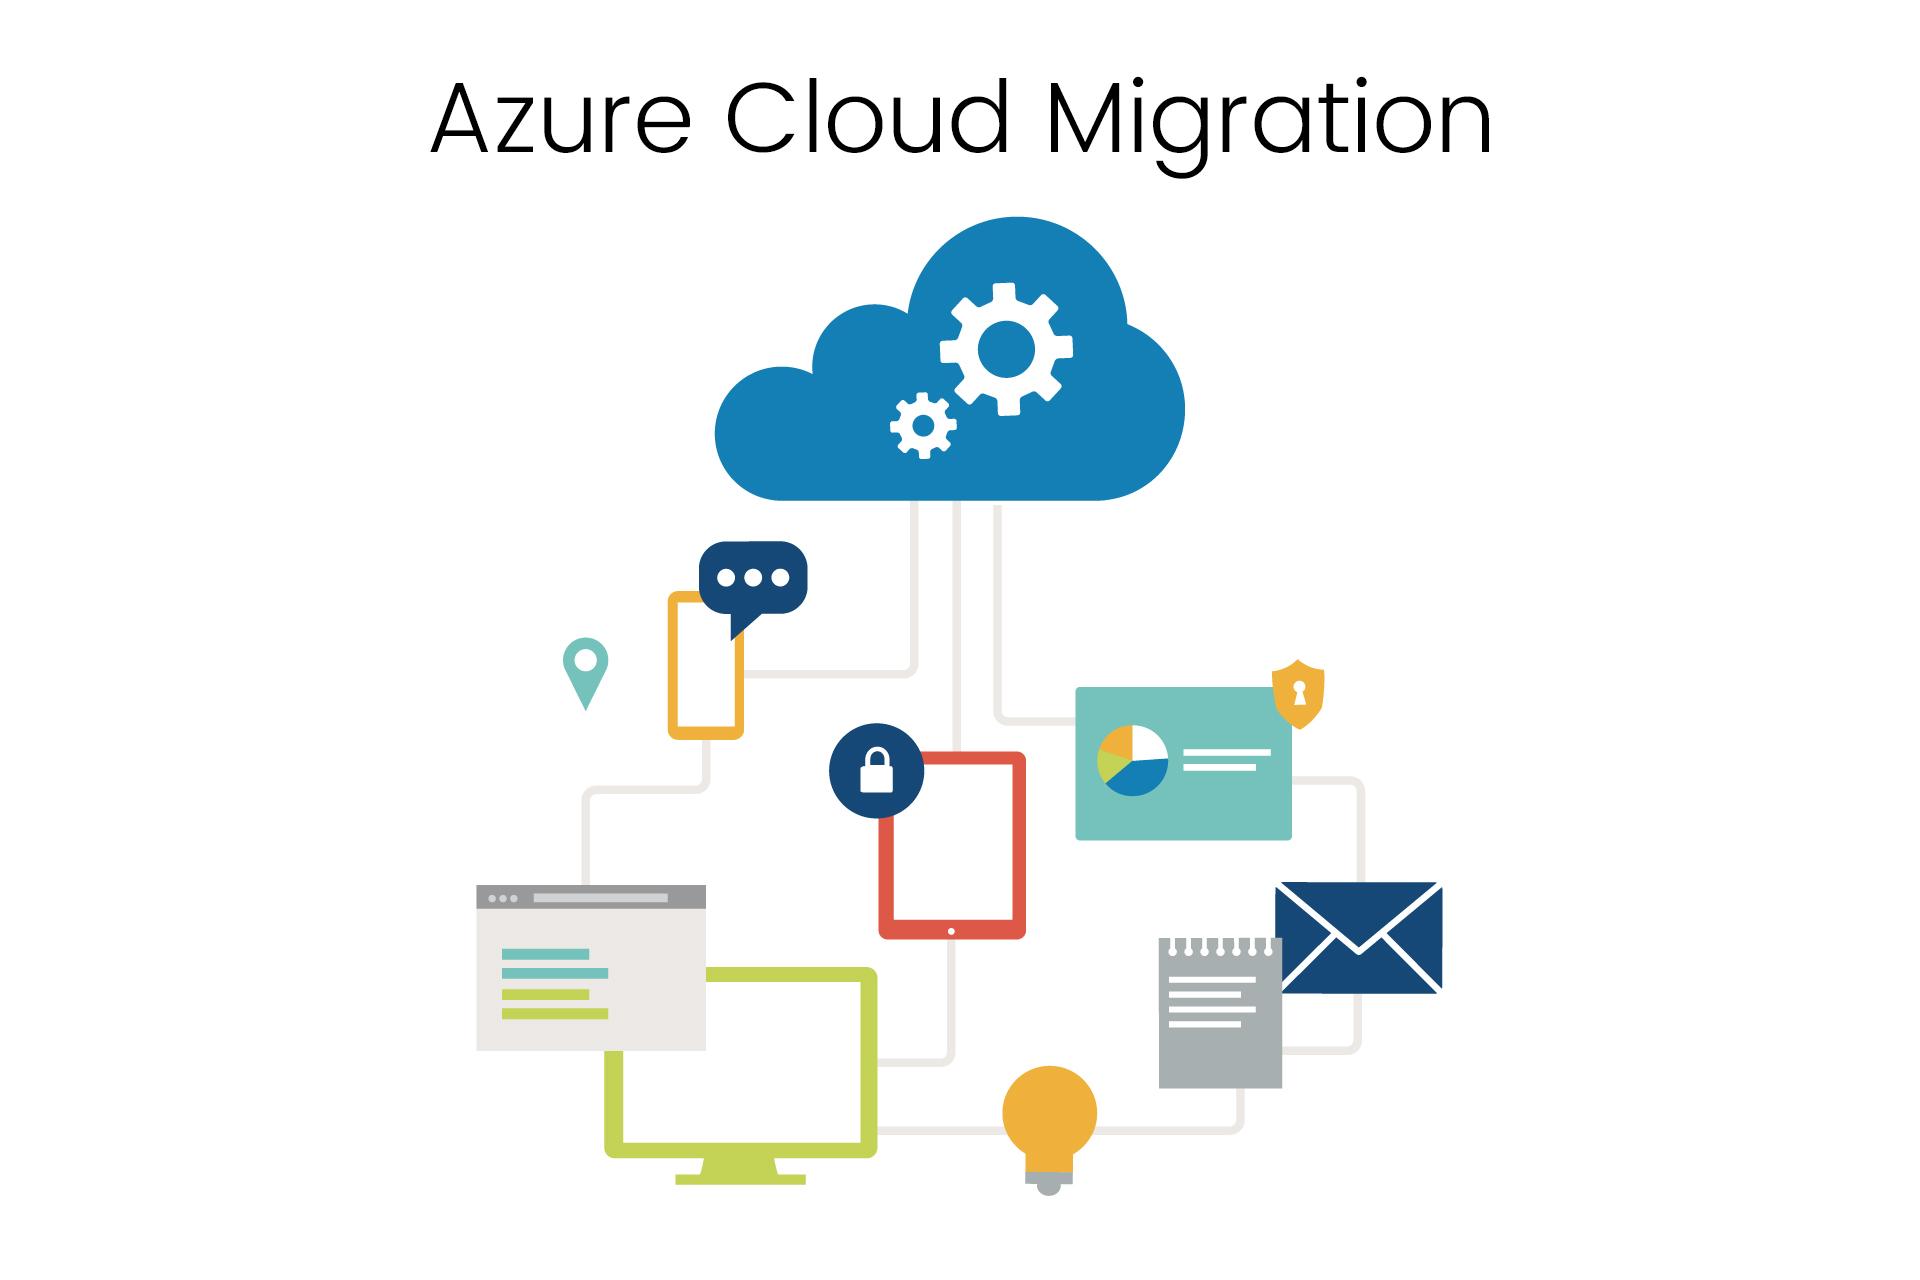 //www.twinleo.com/wp-content/uploads/2018/09/Azure-Cloud-Migration.jpg